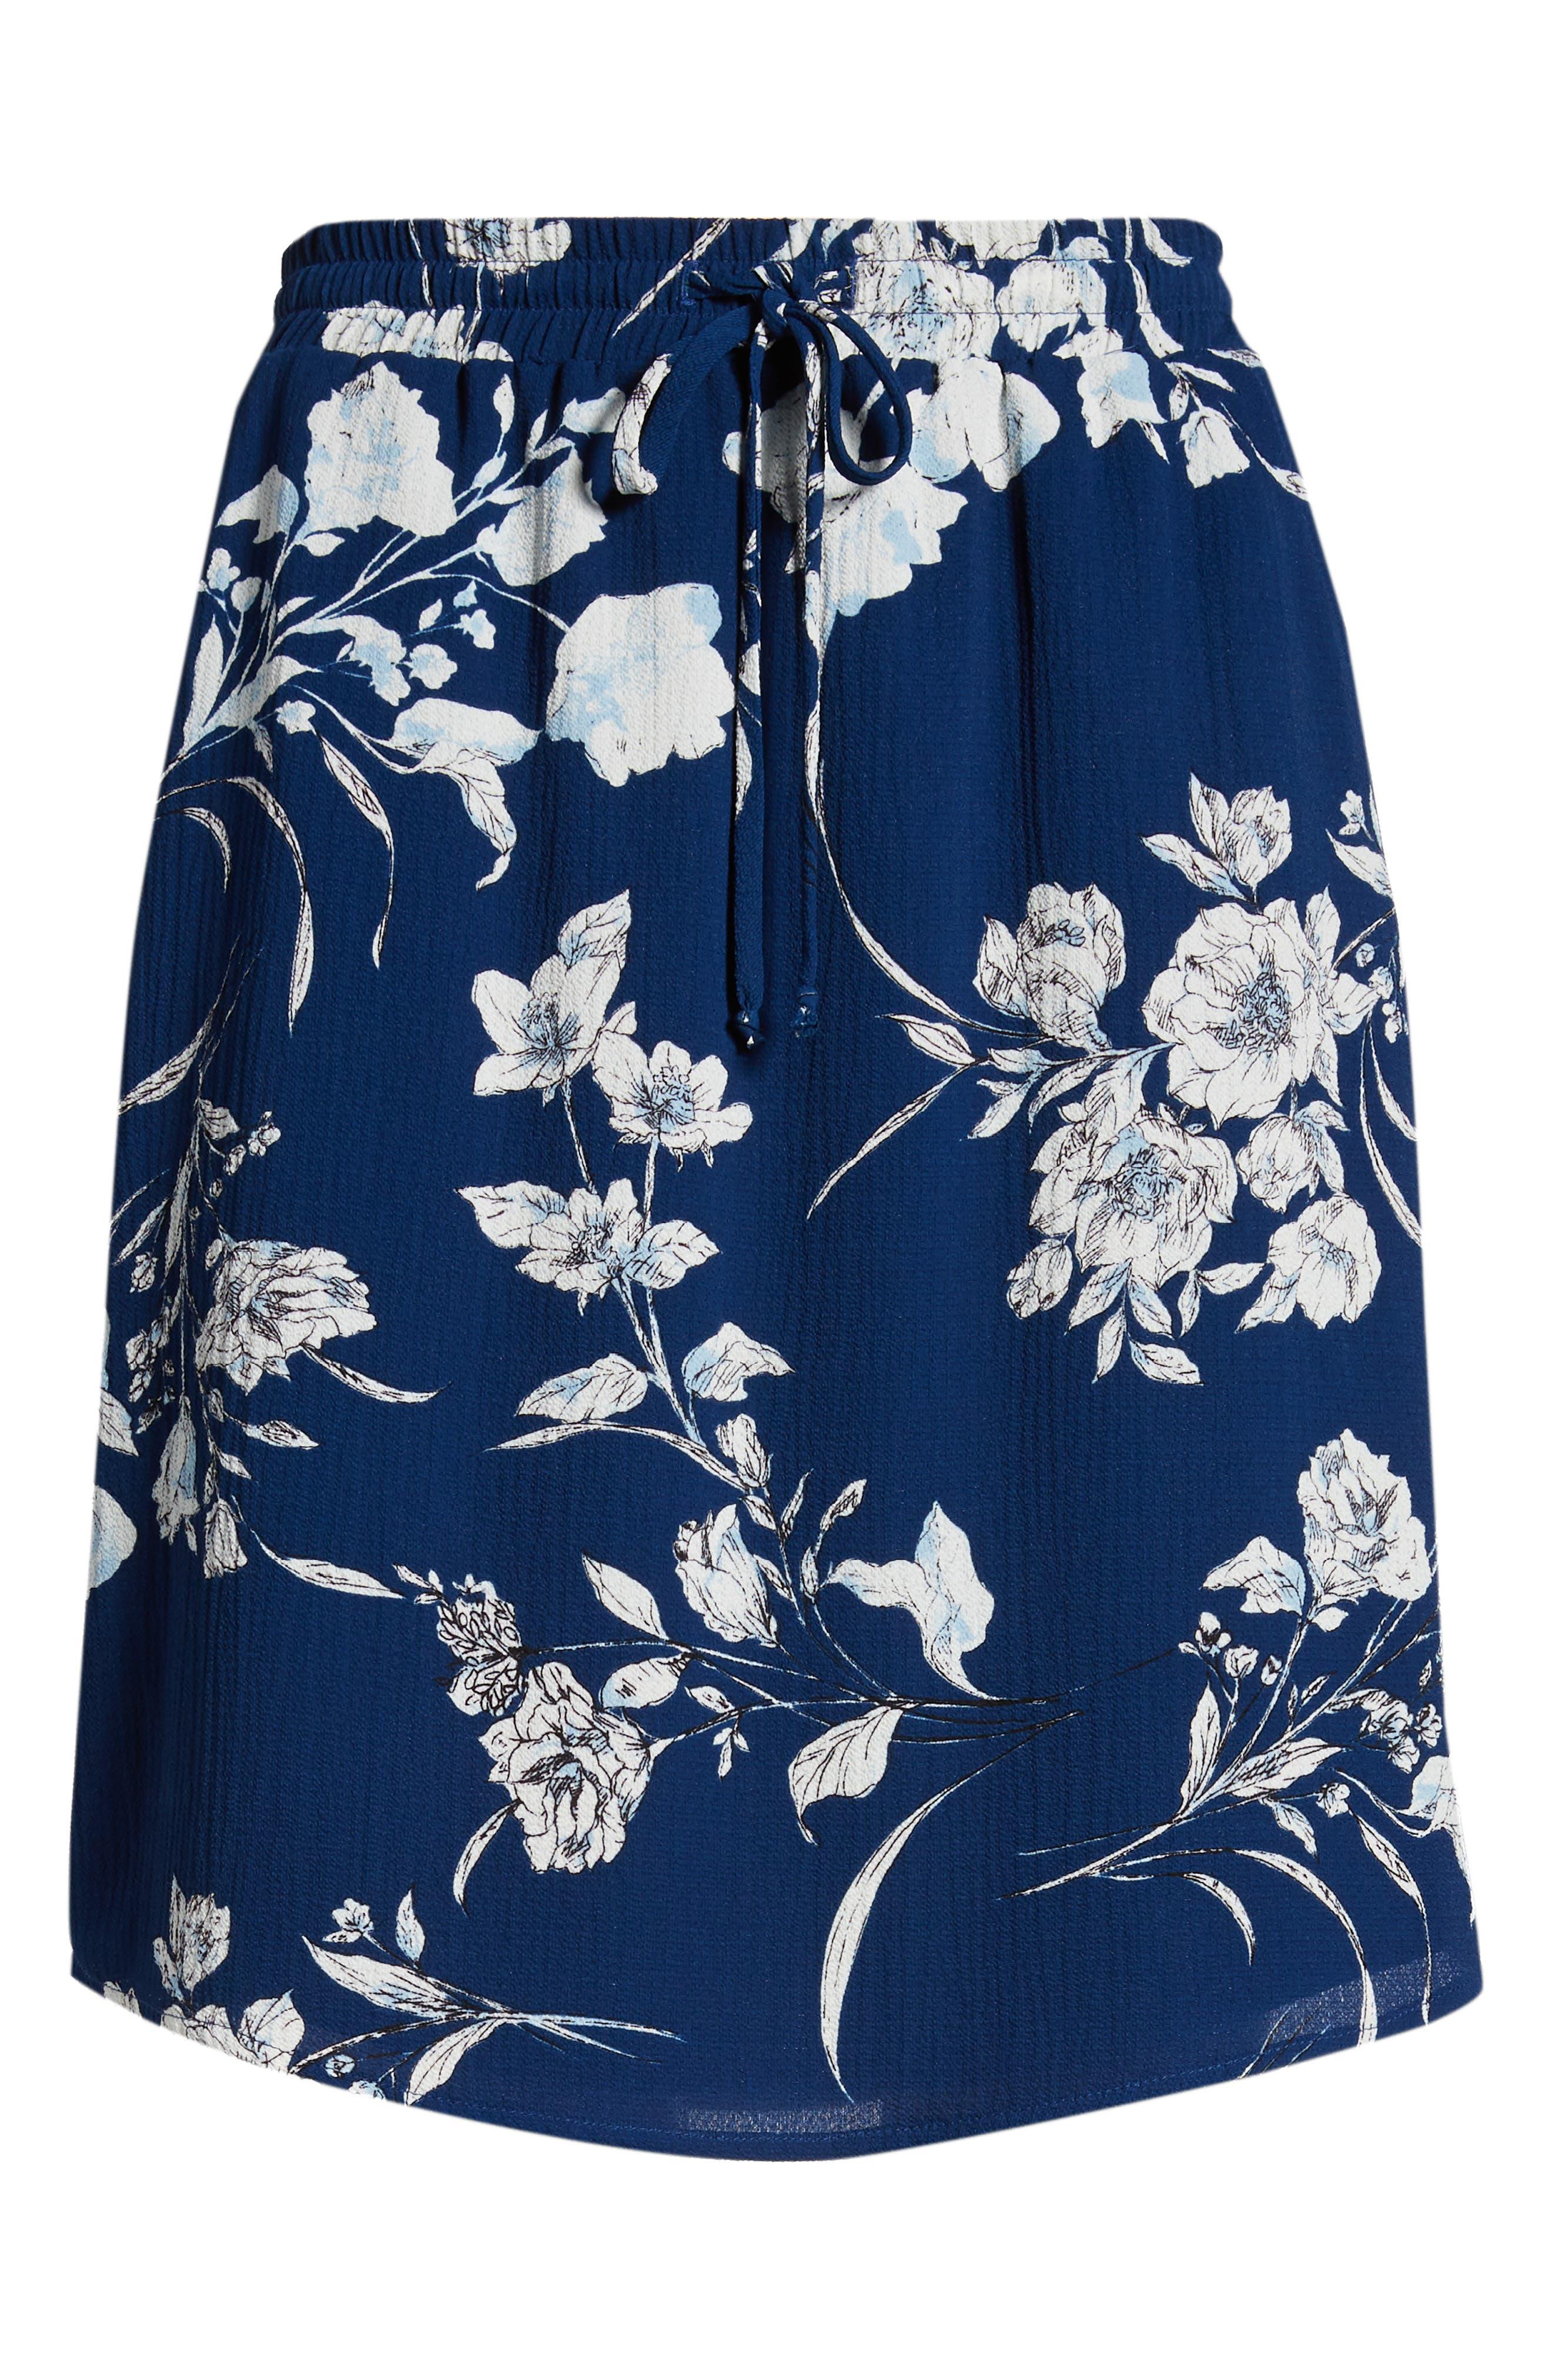 x Hi Sugarplum! Monterey Easy Skirt,                             Alternate thumbnail 7, color,                             Cool Breeze Floral